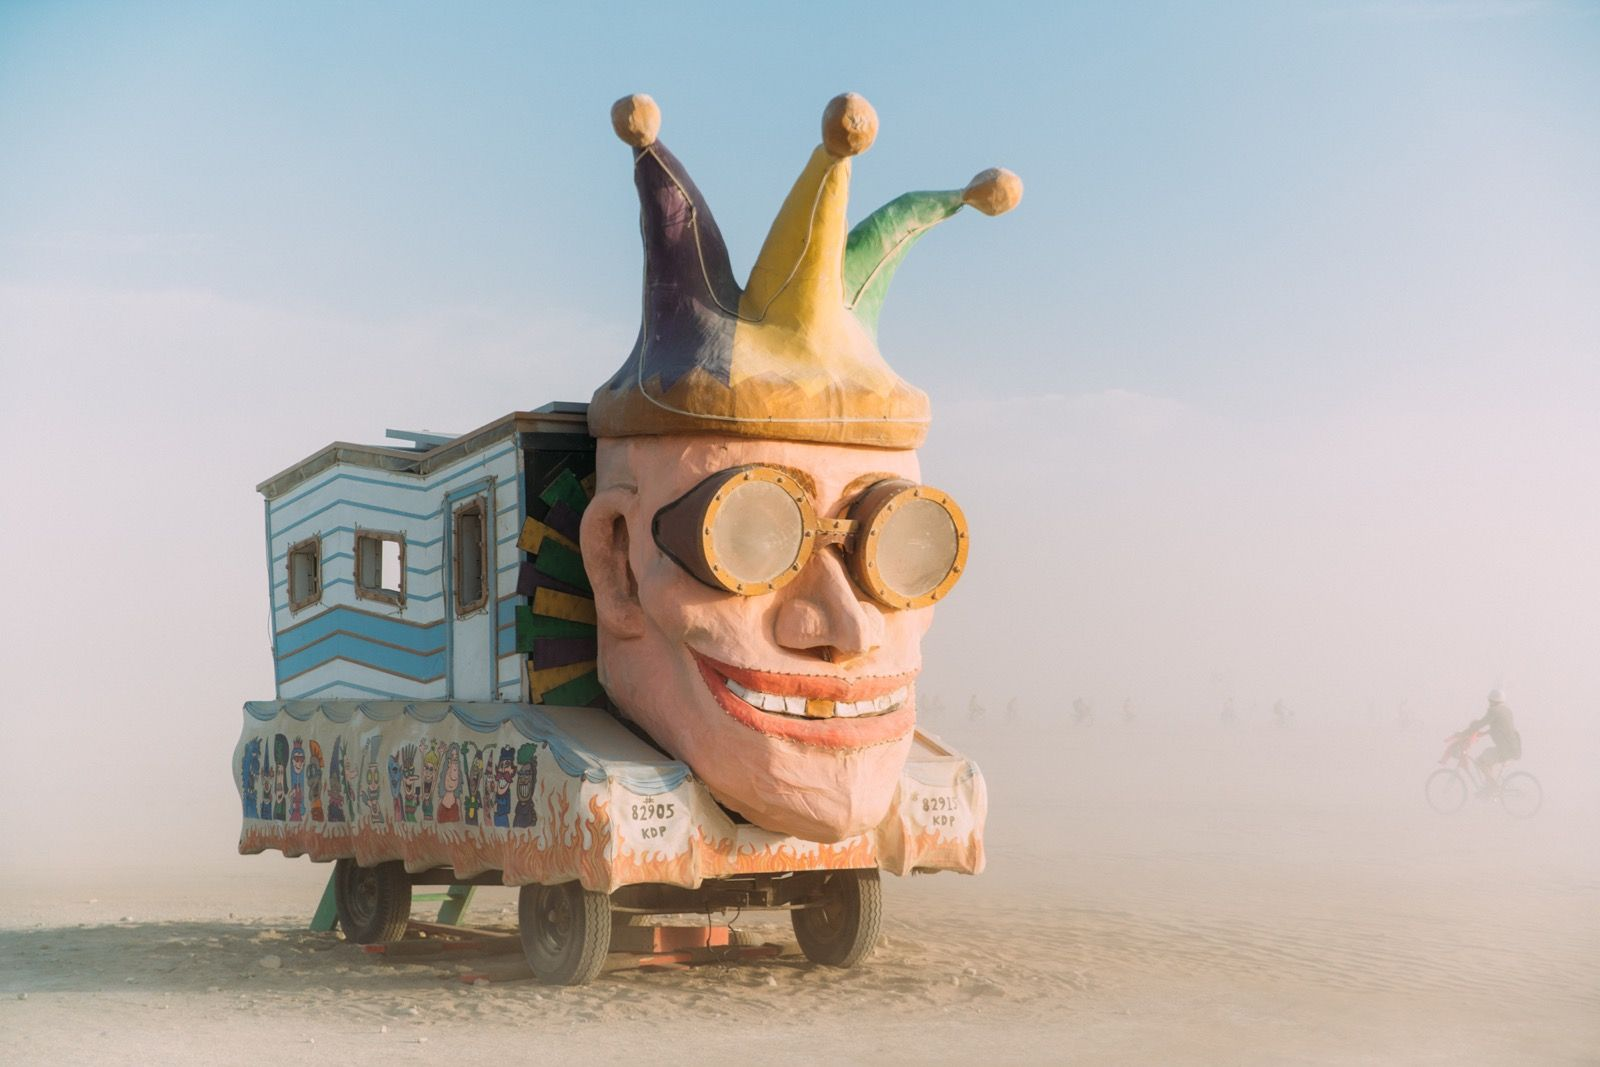 Art of Burning Man 2015 (Photo by: Galen Oakes) | Burning